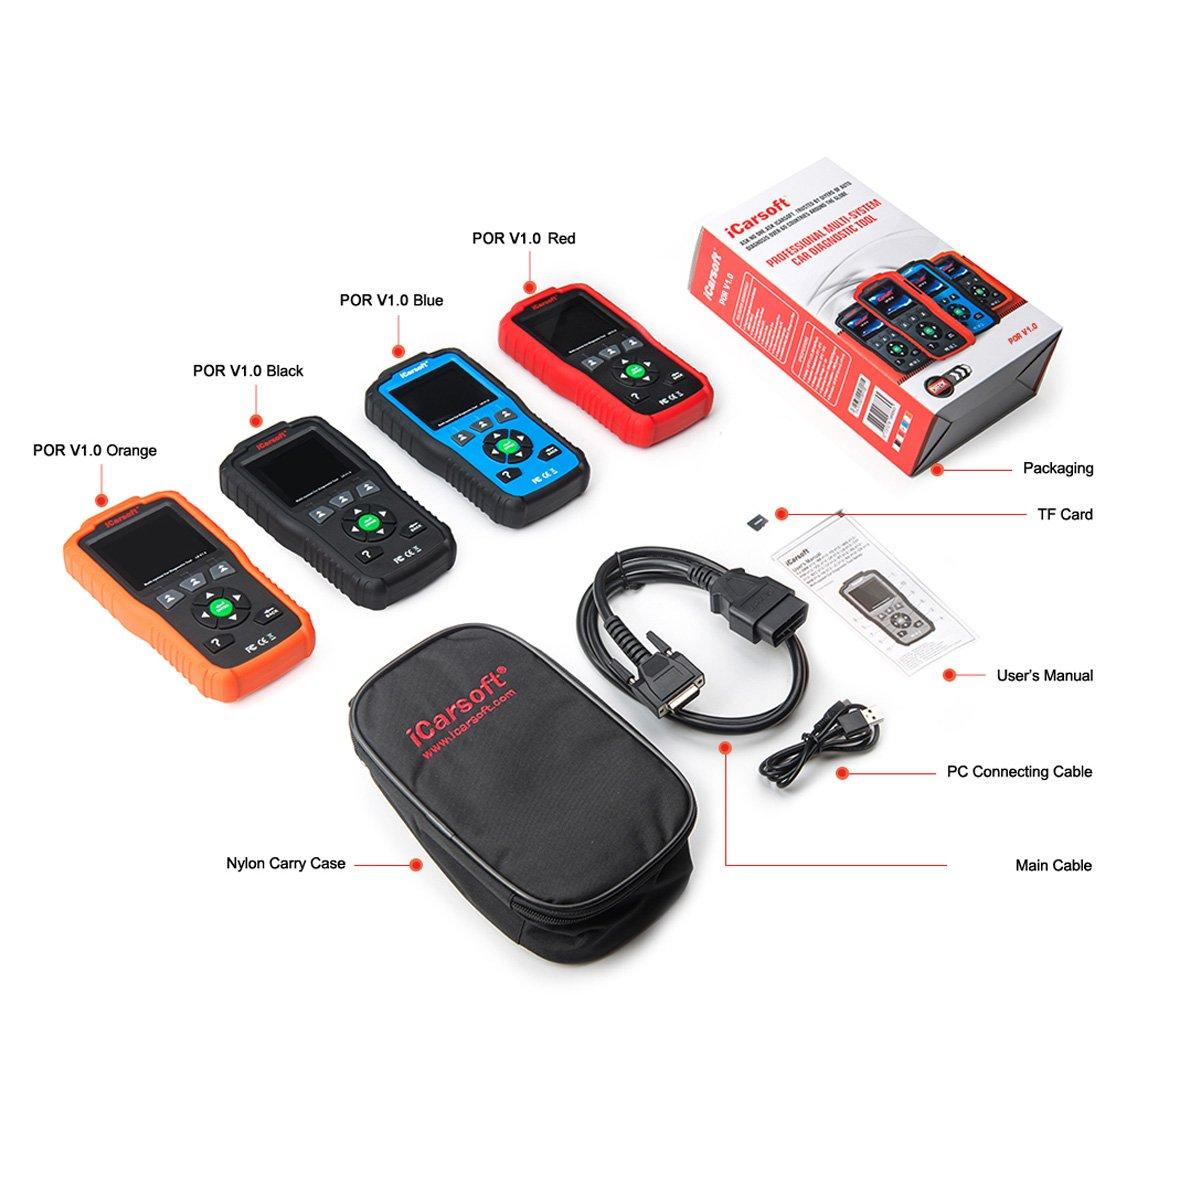 iCarsoft Auto Diagnostic Scanner POR V1.0 for Porsche with Airbag Scan,Oil Service Reset ect